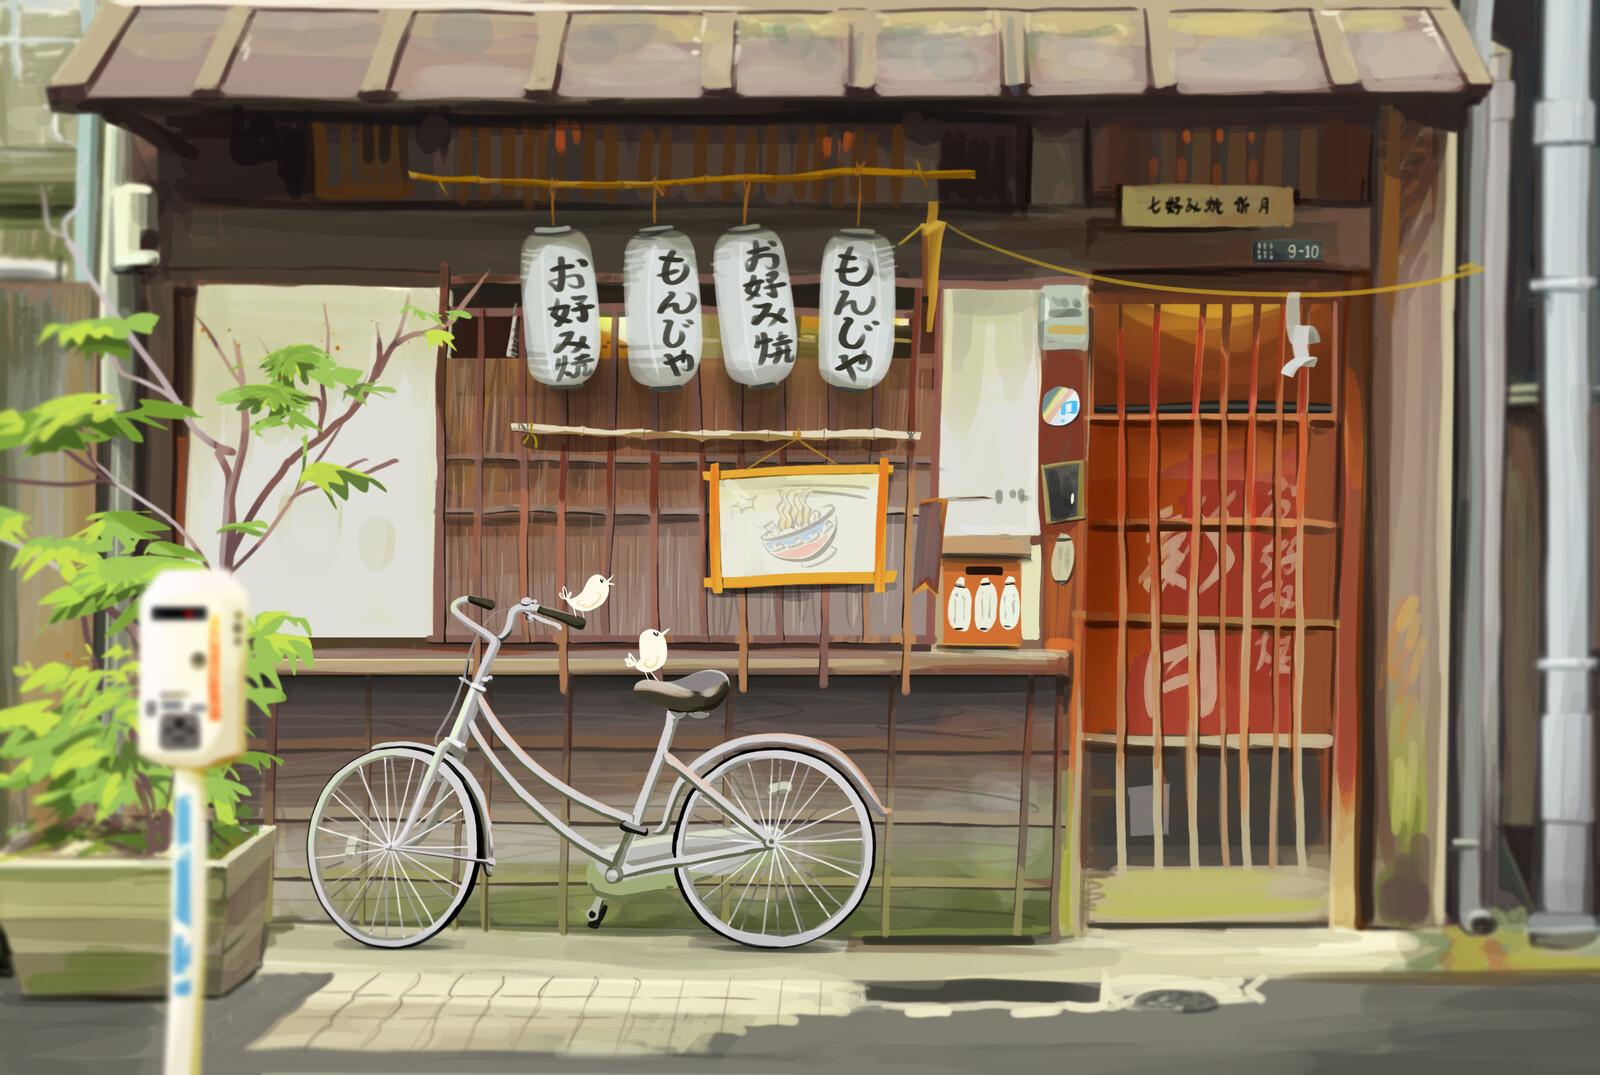 Restaurant Front | Study